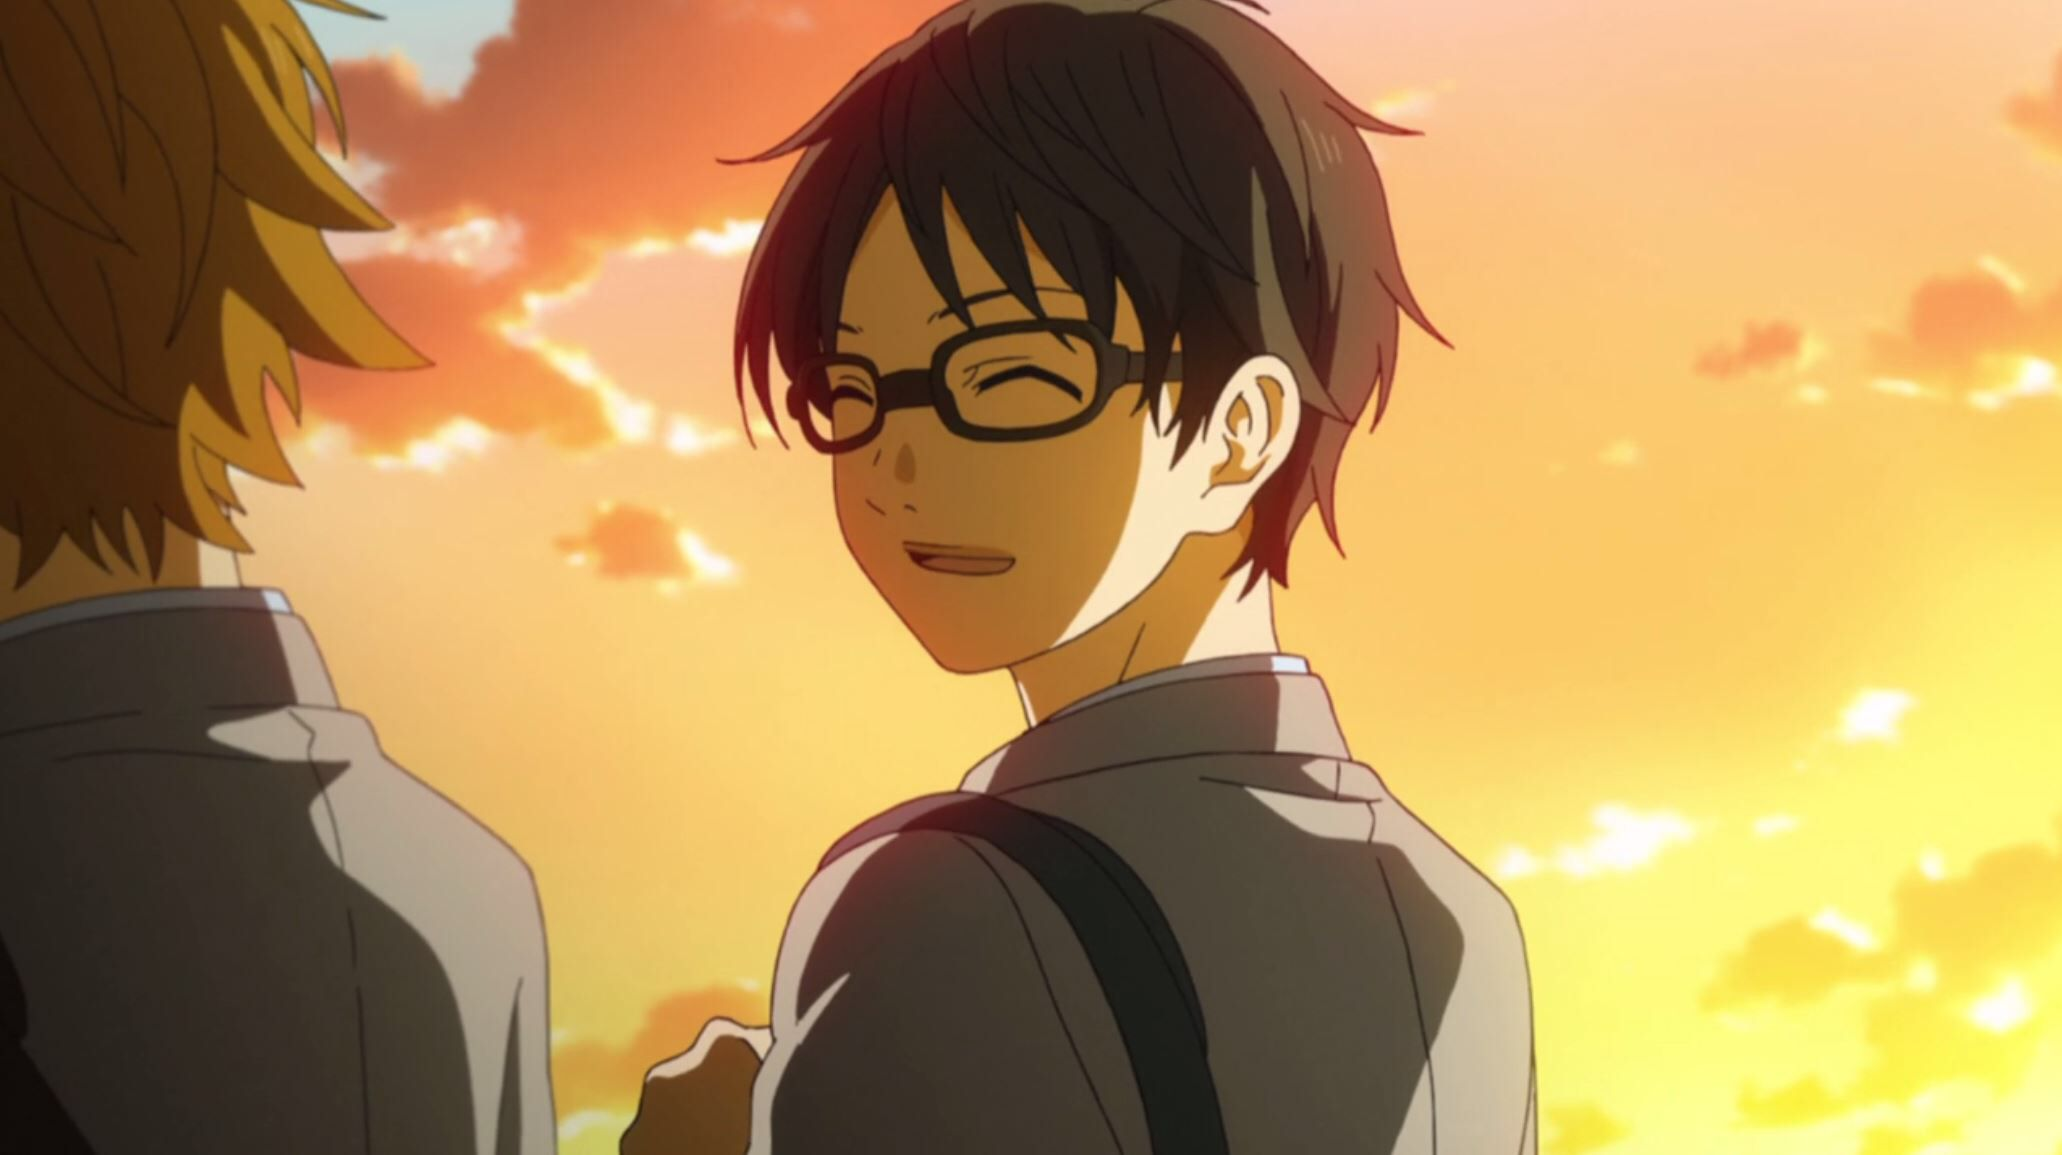 Kousei Arima From Shigatsu Wa Kimi No Uso Your Lie In April Anime Romance Me Me Me Anime